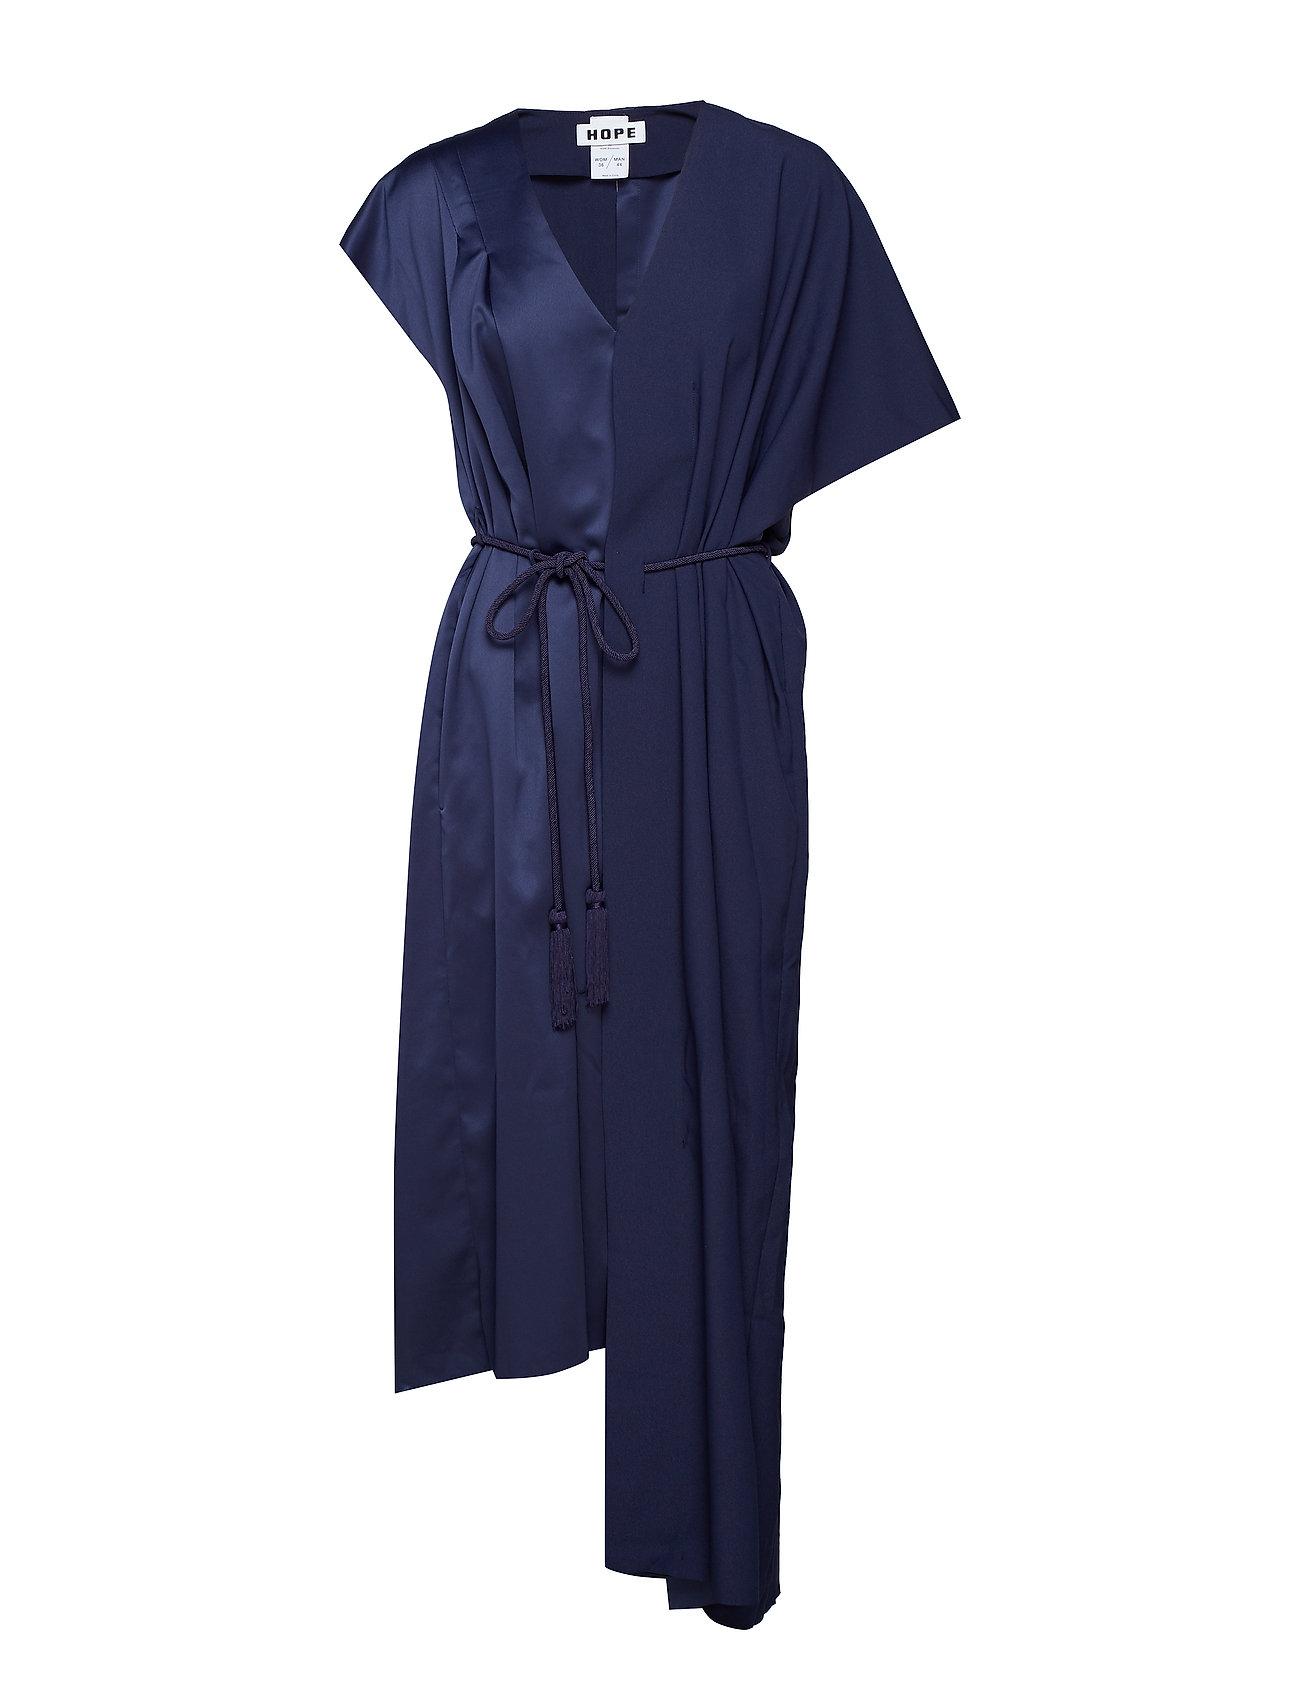 Hope Temple Dress - NAVY